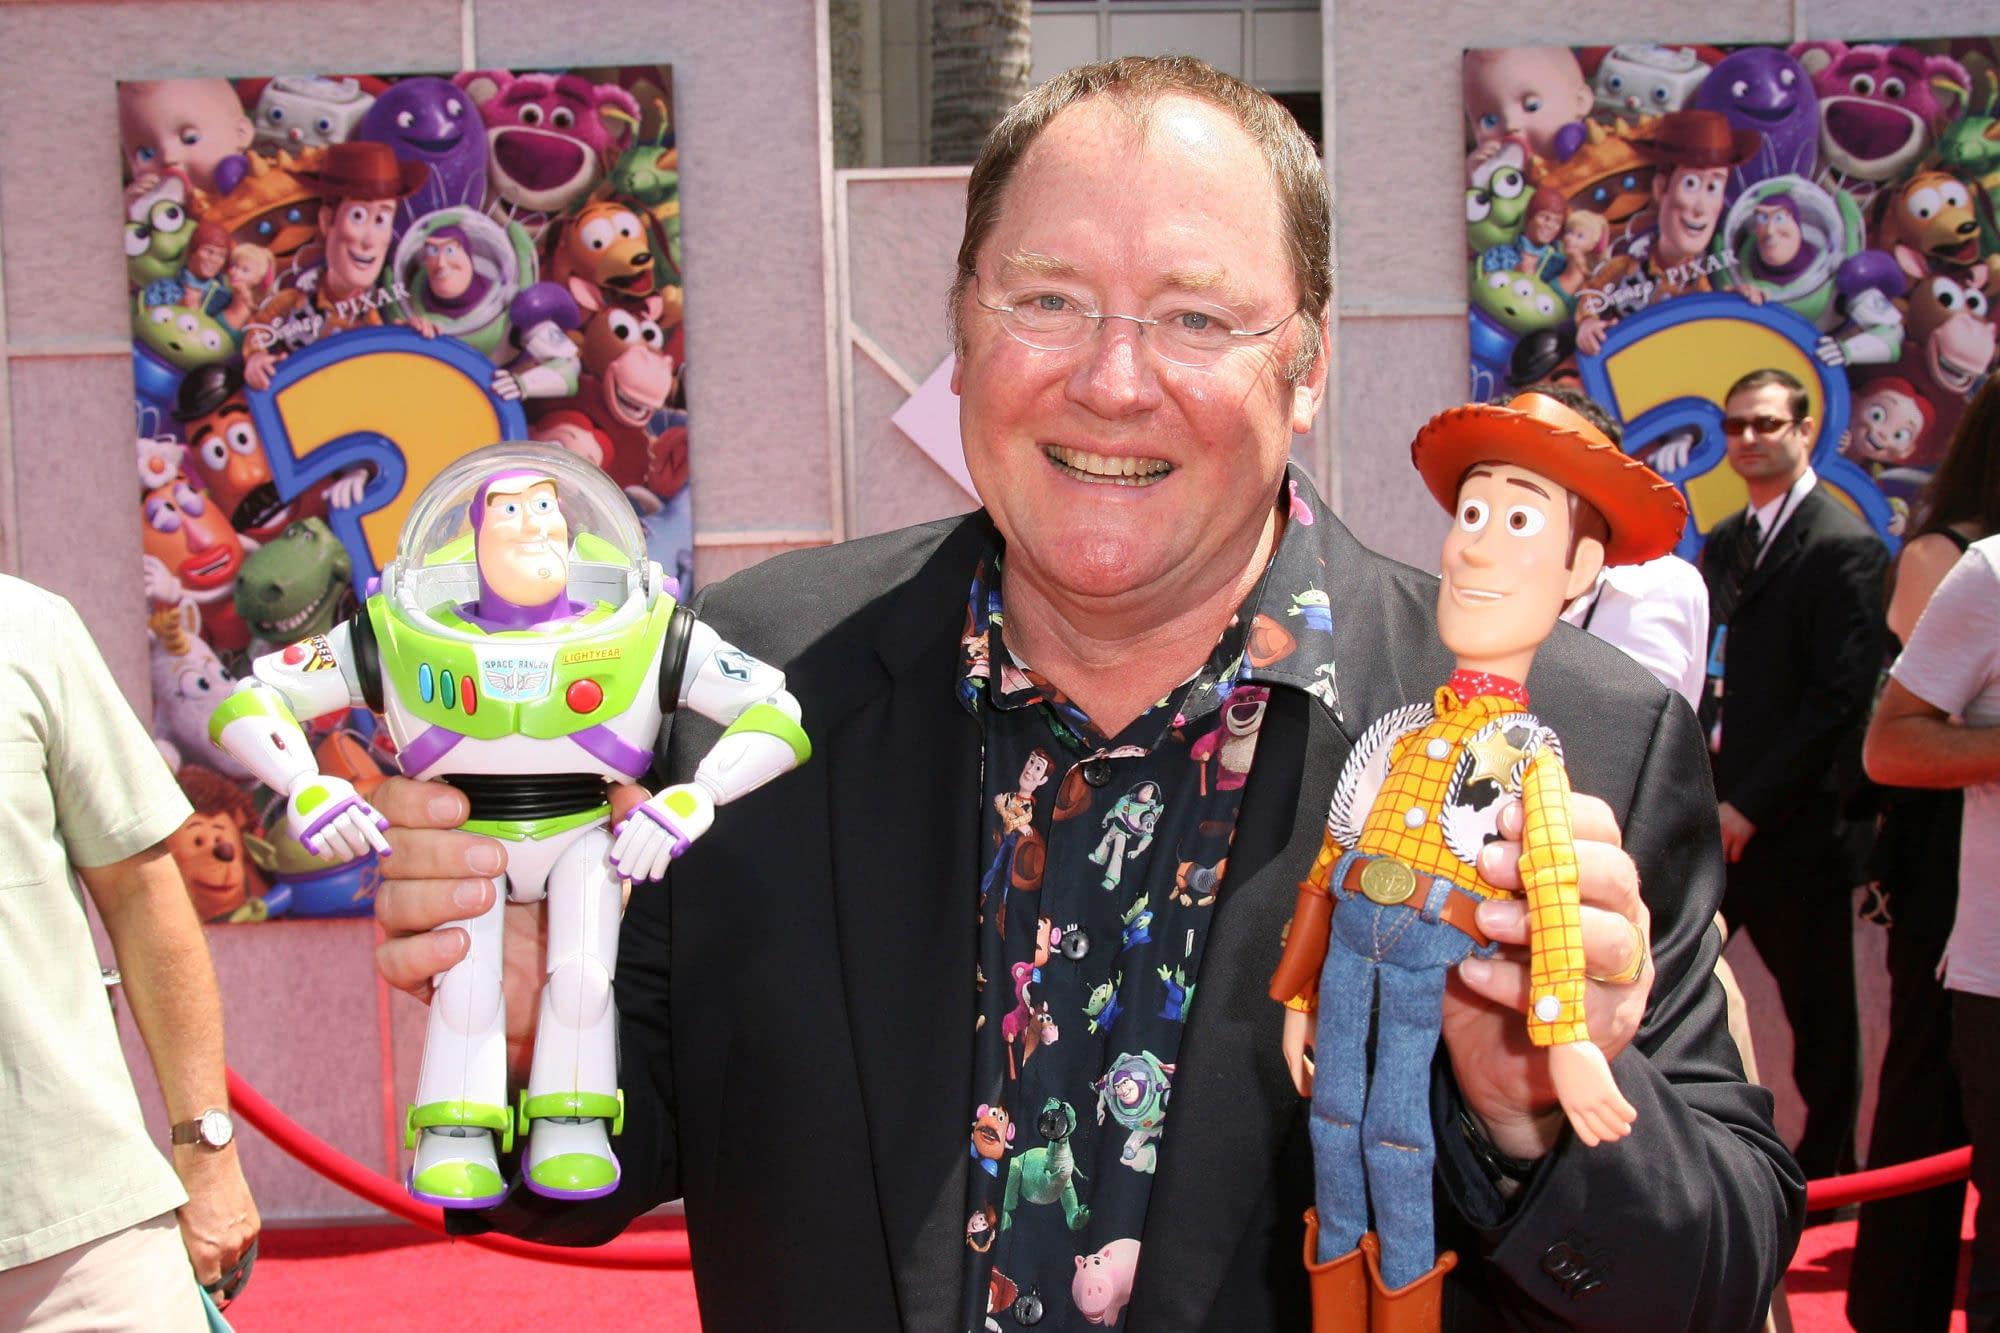 John Lasseter Joins Skydance as Head of Animation